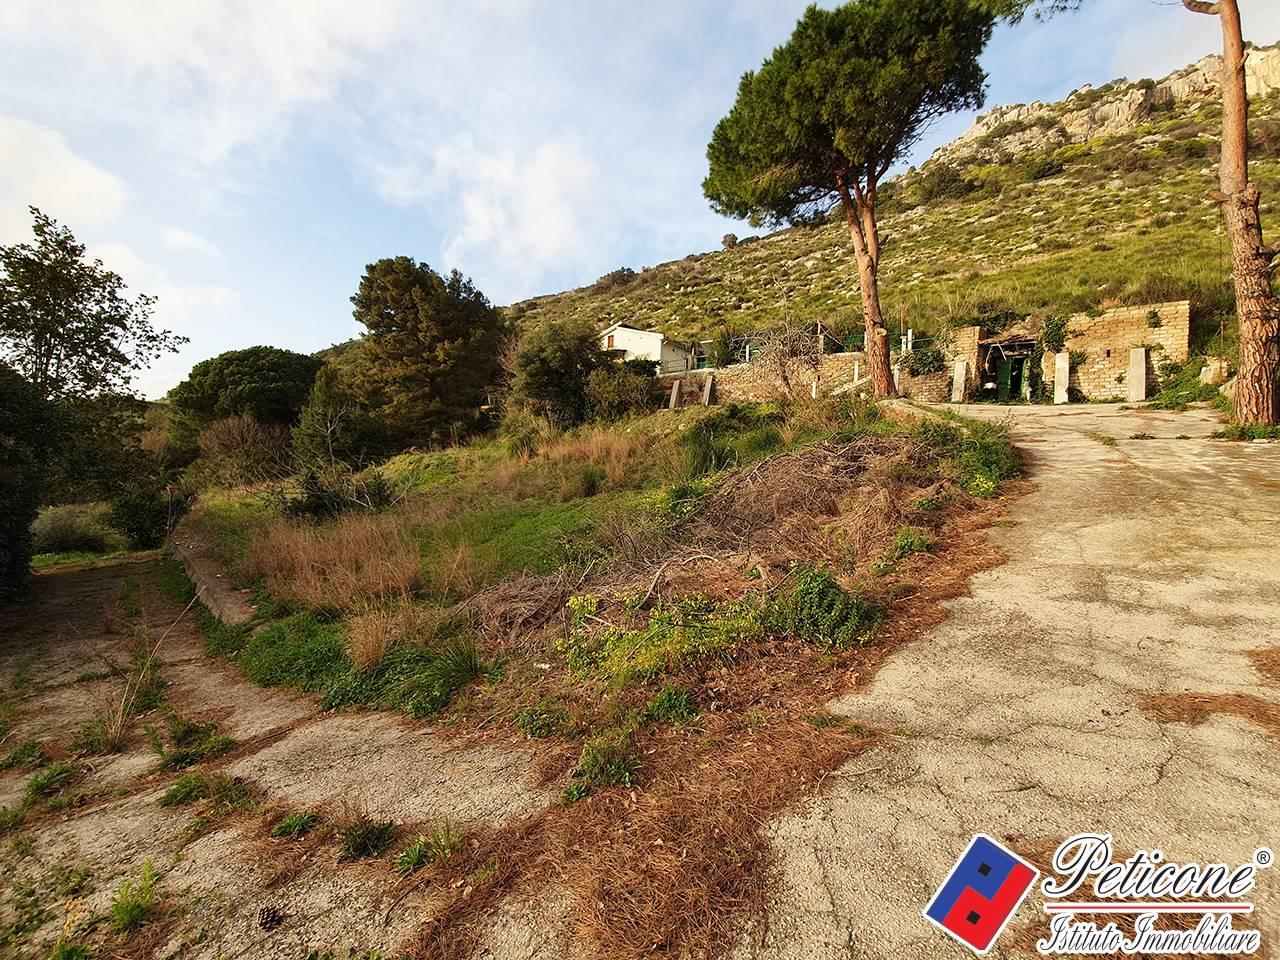 Villa in Vendita a Sperlonga: 3 locali, 50 mq - Foto 2